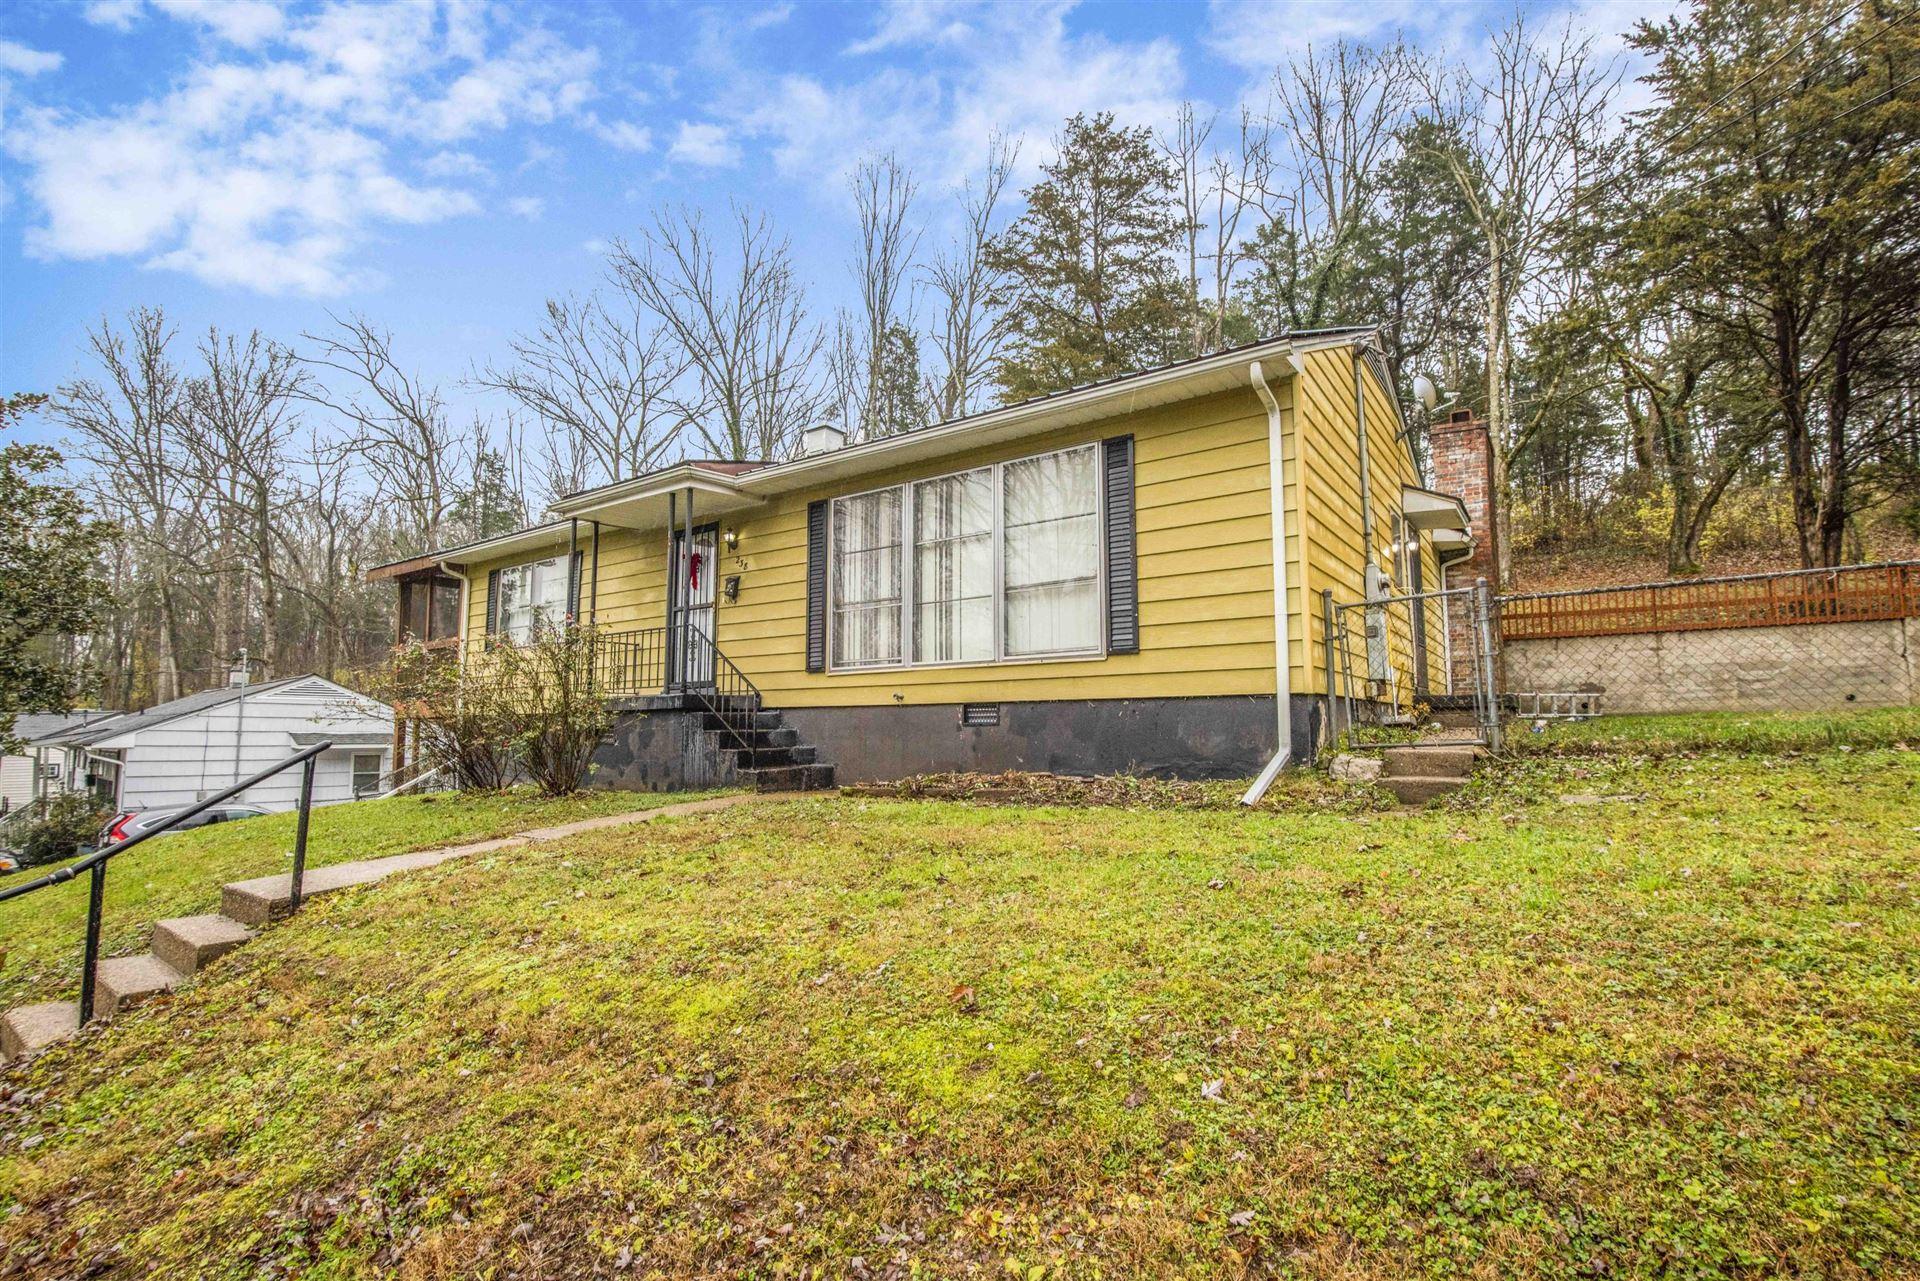 Photo of 238 East Drive, Oak Ridge, TN 37830 (MLS # 1138330)